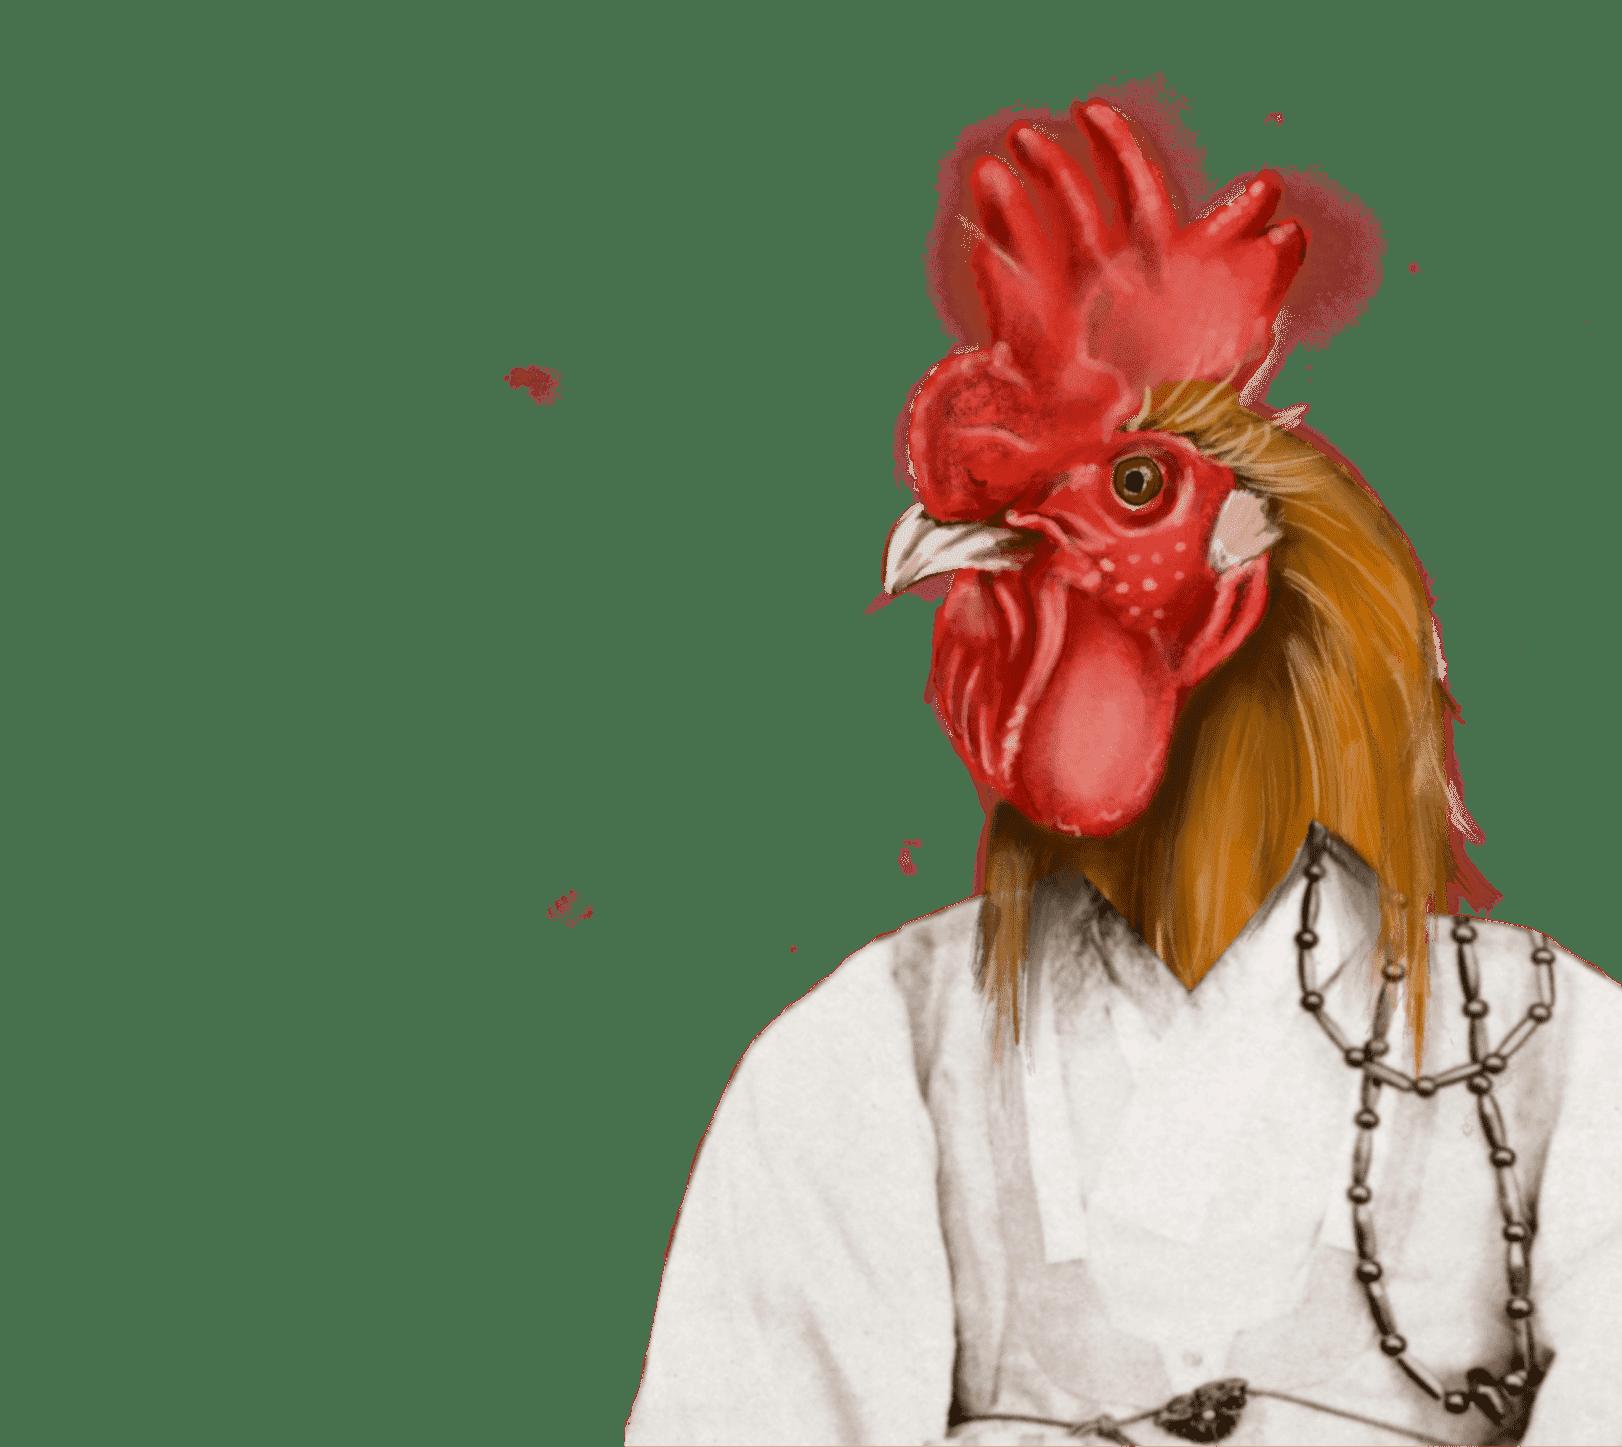 The Koma Sliders Chicken